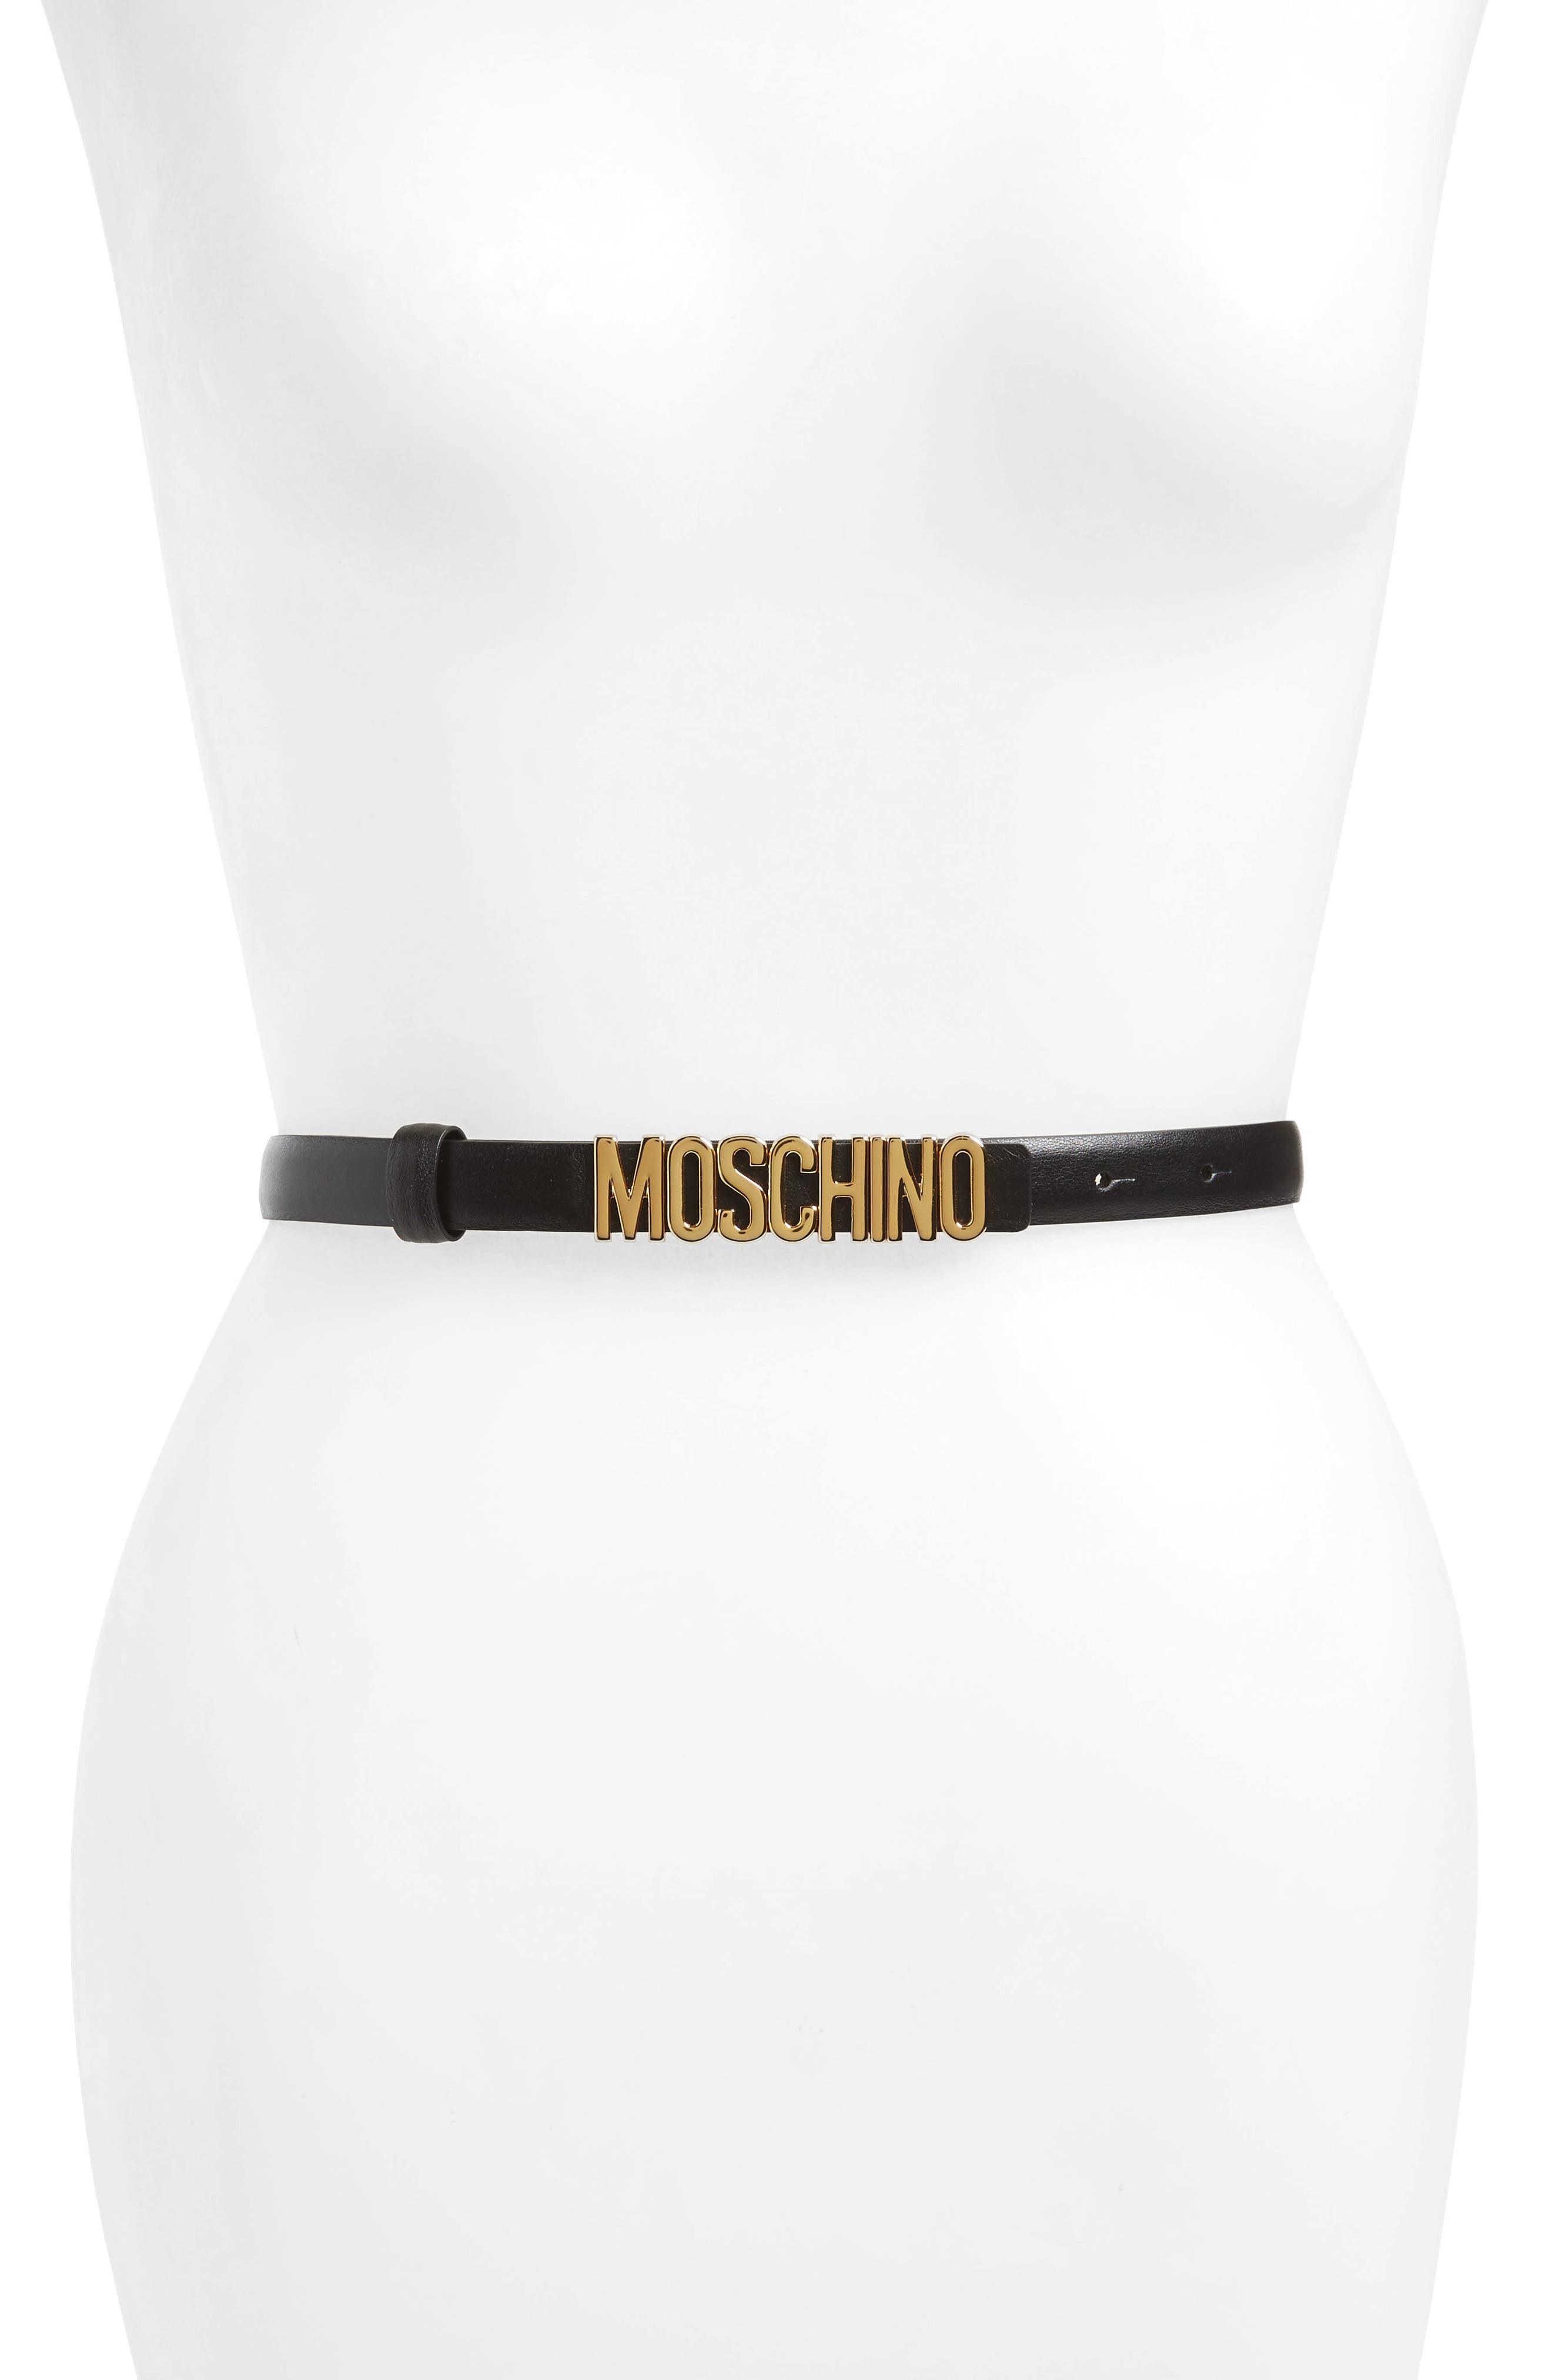 Moschino Logo Calfskin Leather Skinny Belt, Black/ Gold